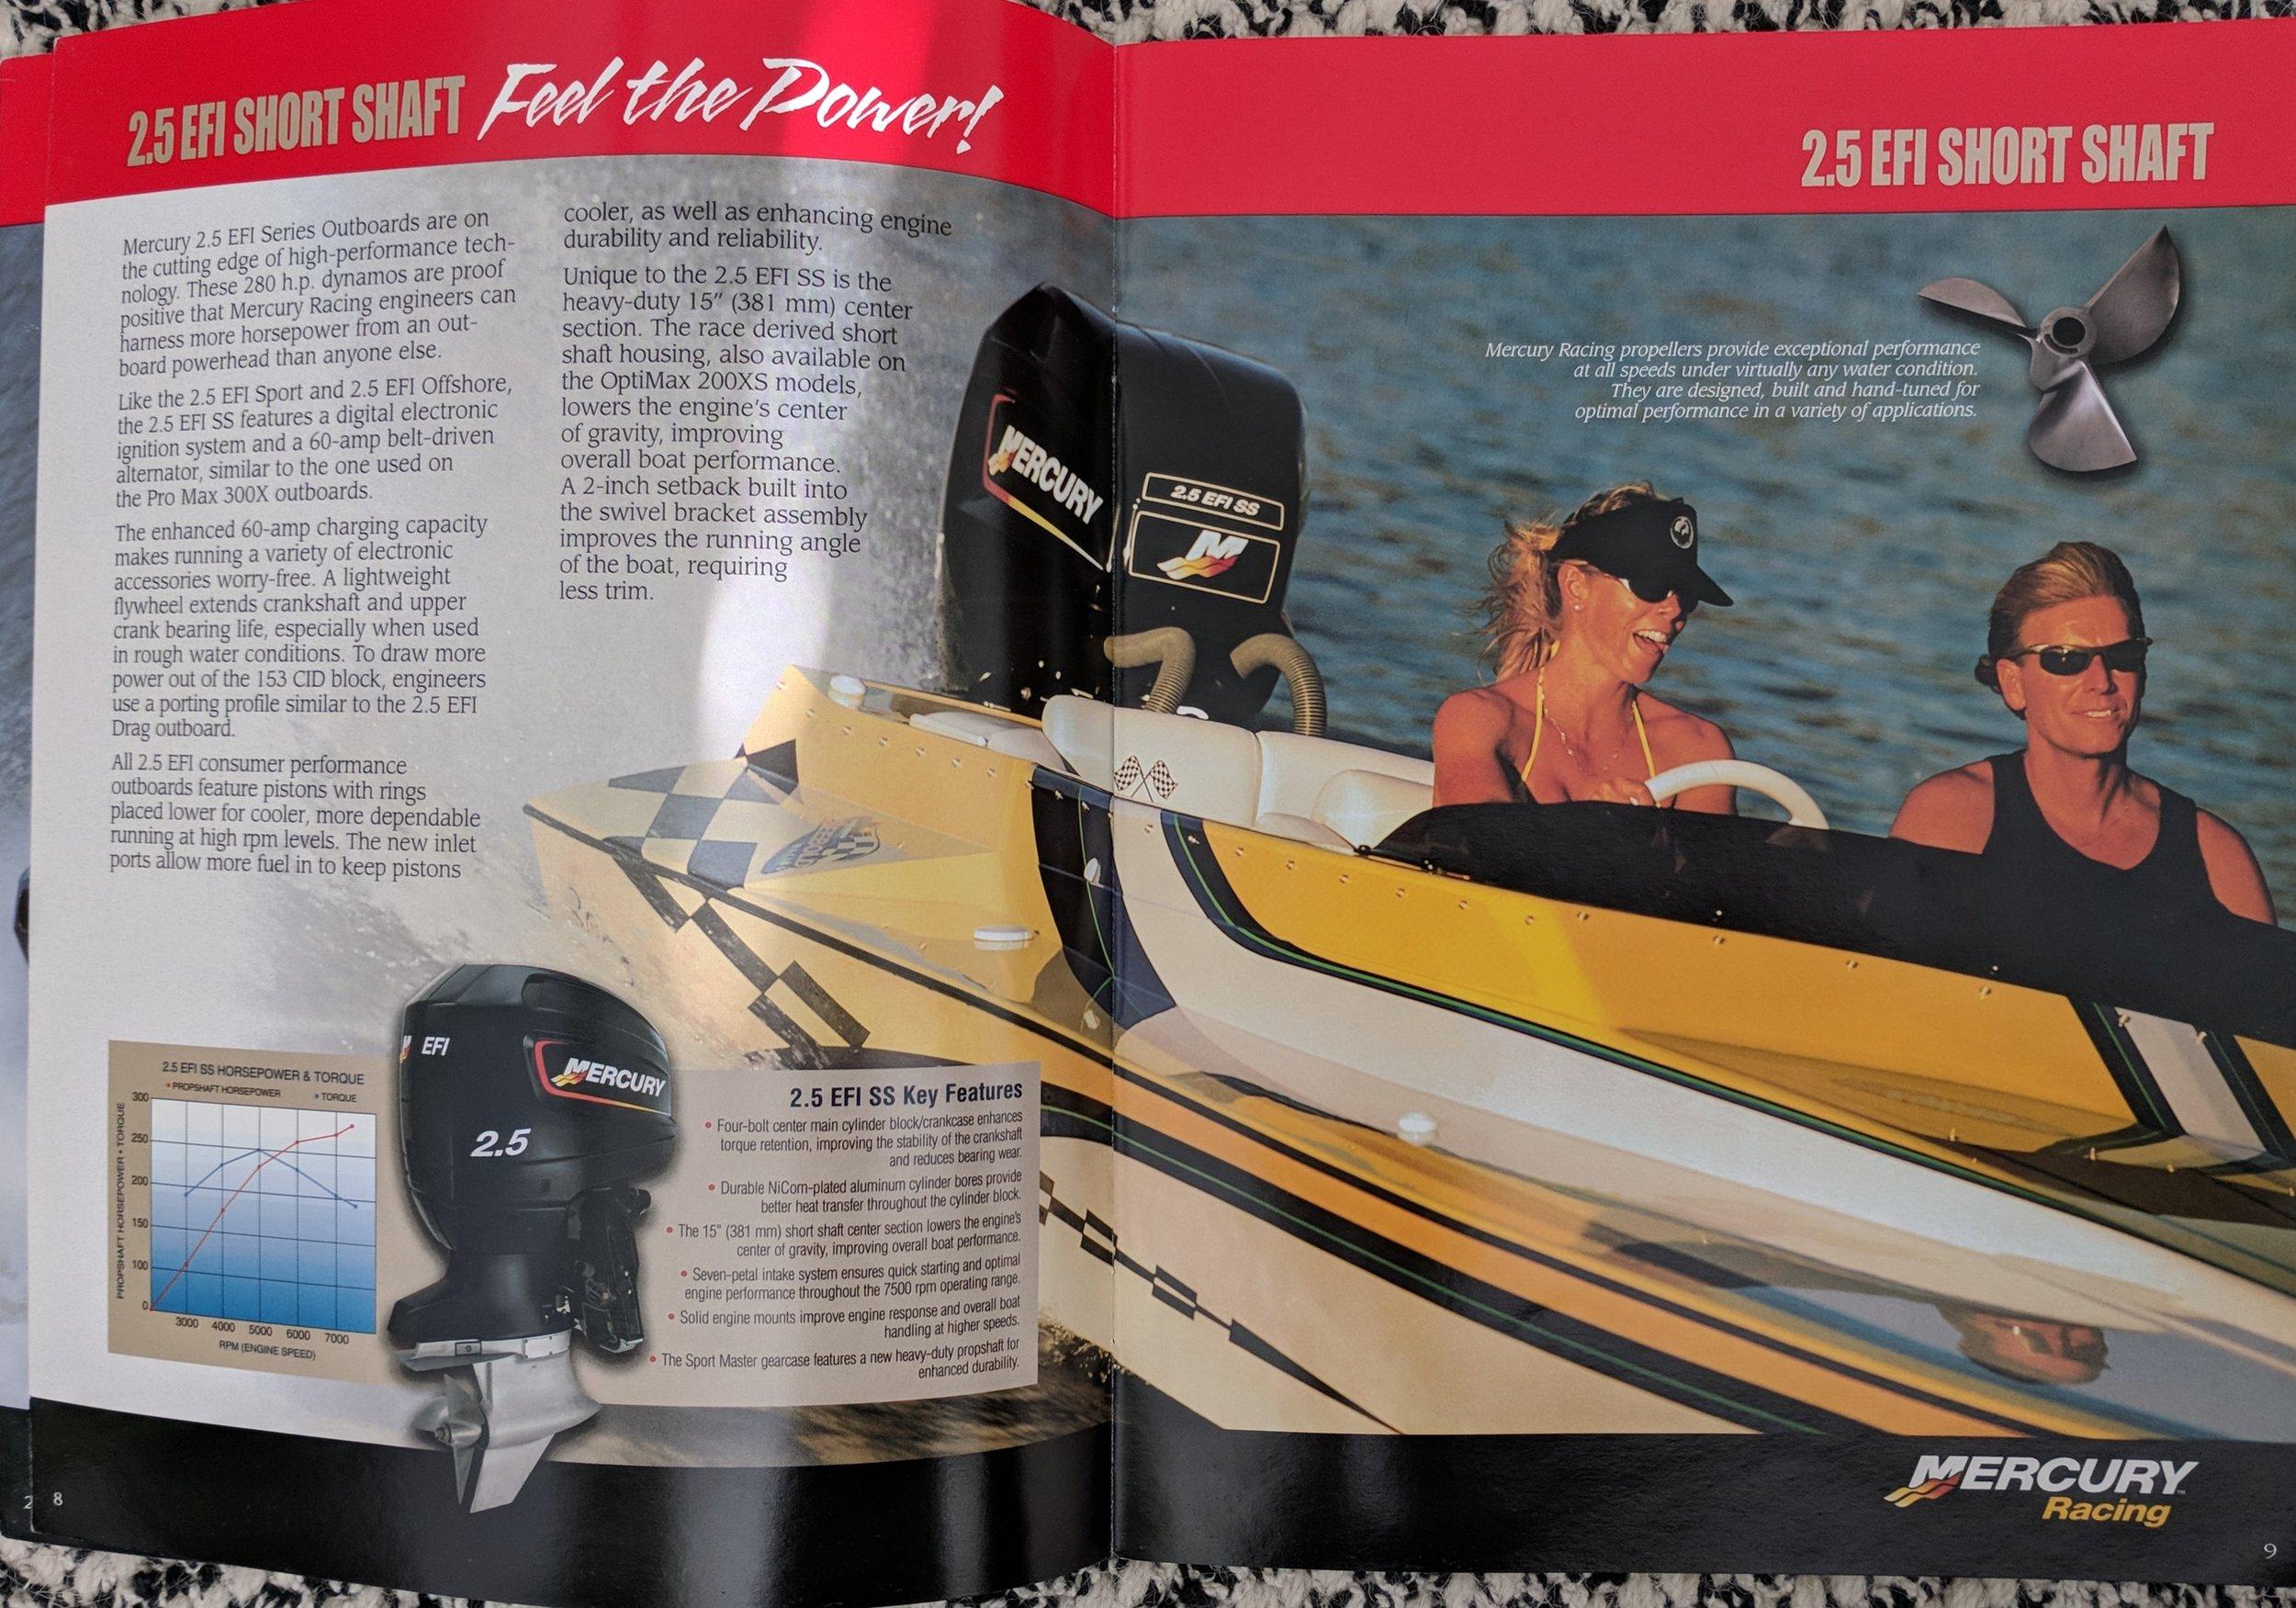 A 2001 Mercury Racing 2.5 SS 280 HP, the ultimate lightweight powerhouse.